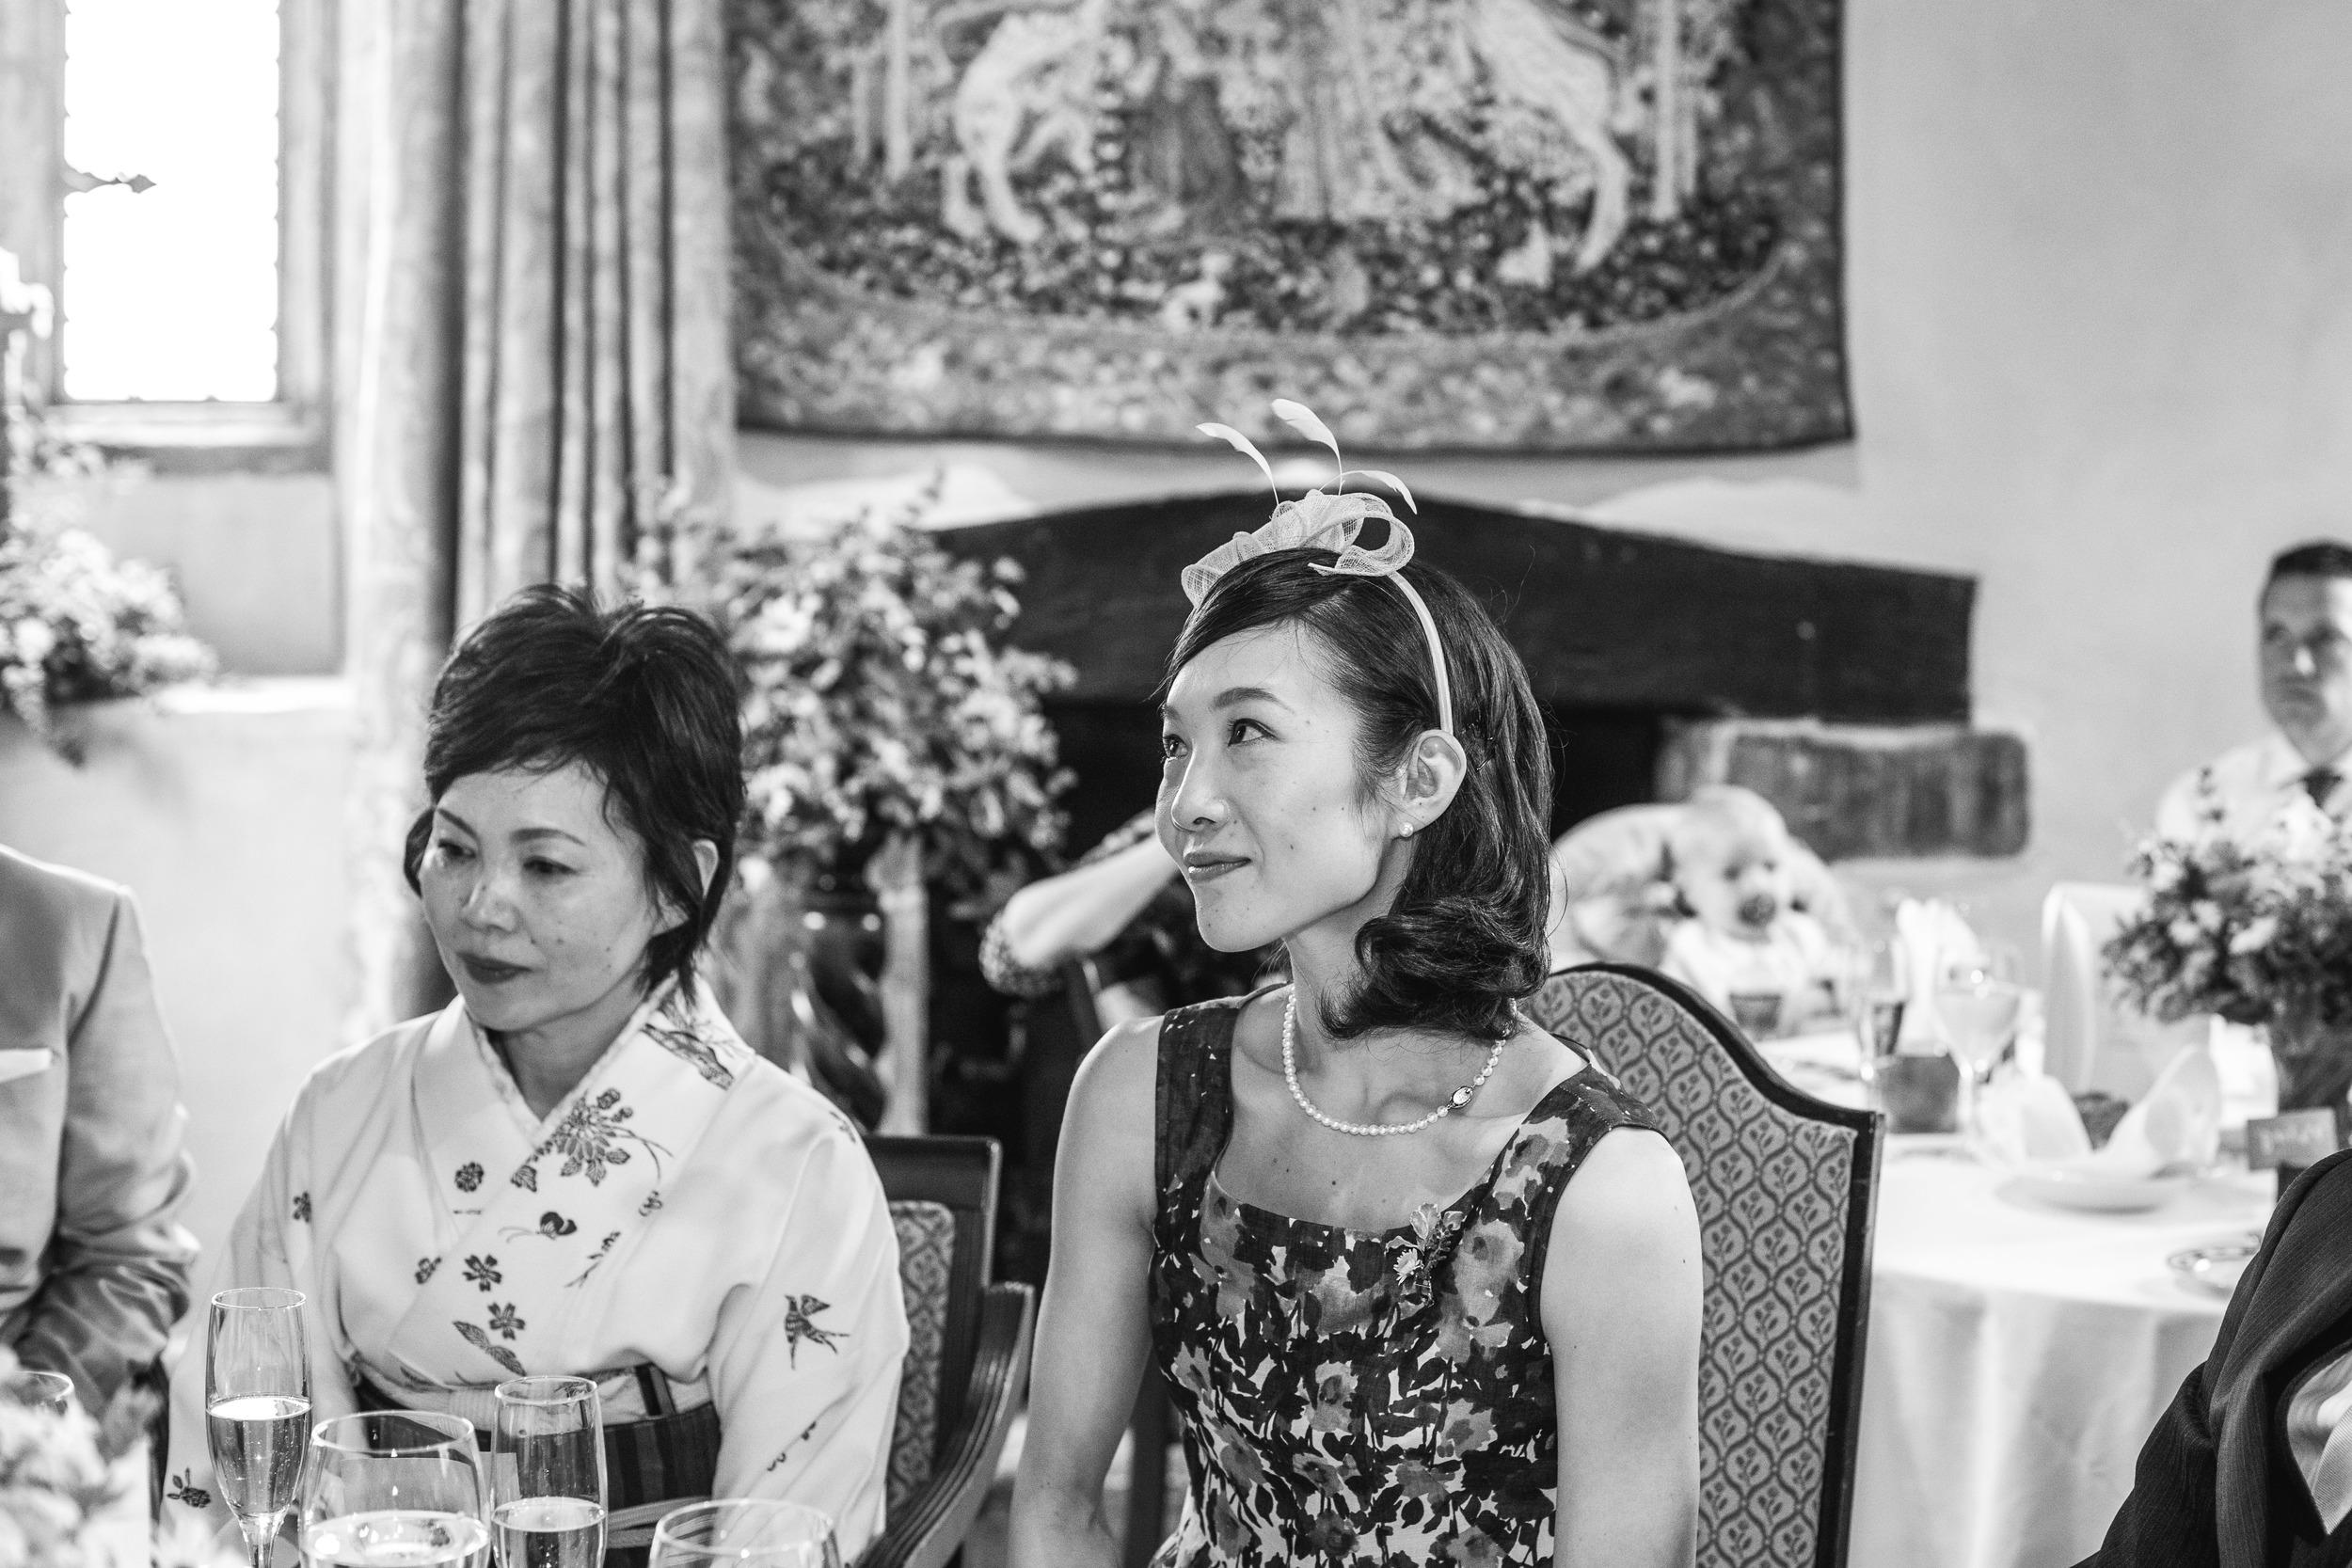 mahoka nick bailiffscourt wedding celebration-034.jpg